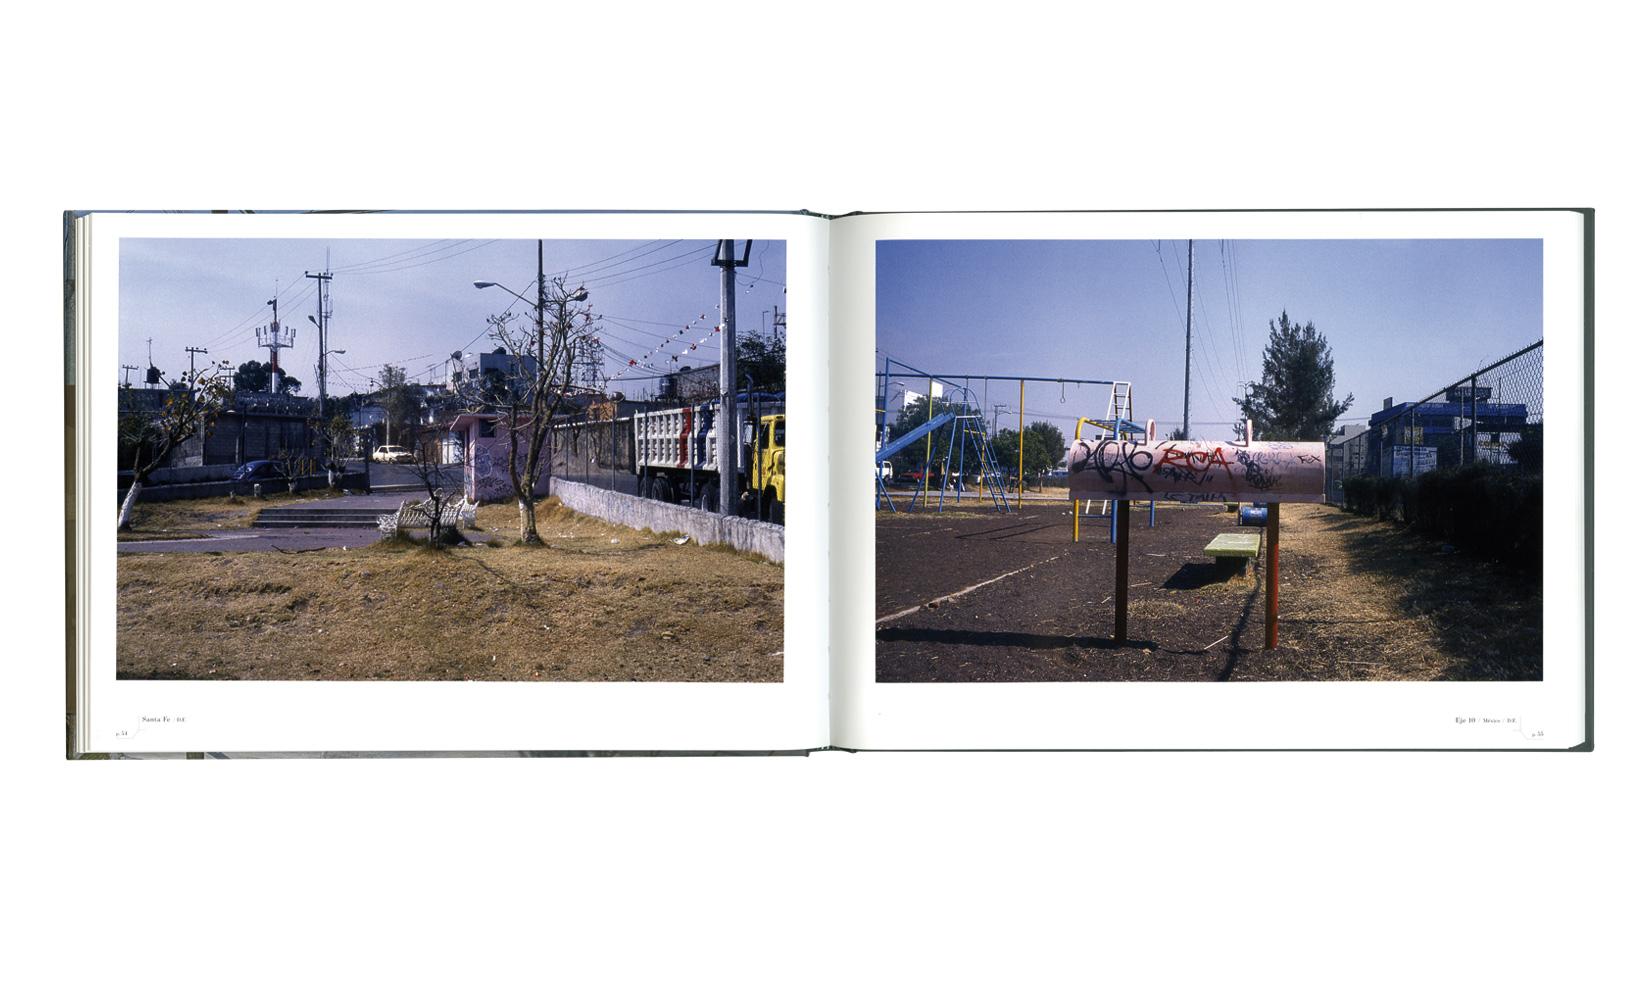 Poca-Luz-1005.jpg